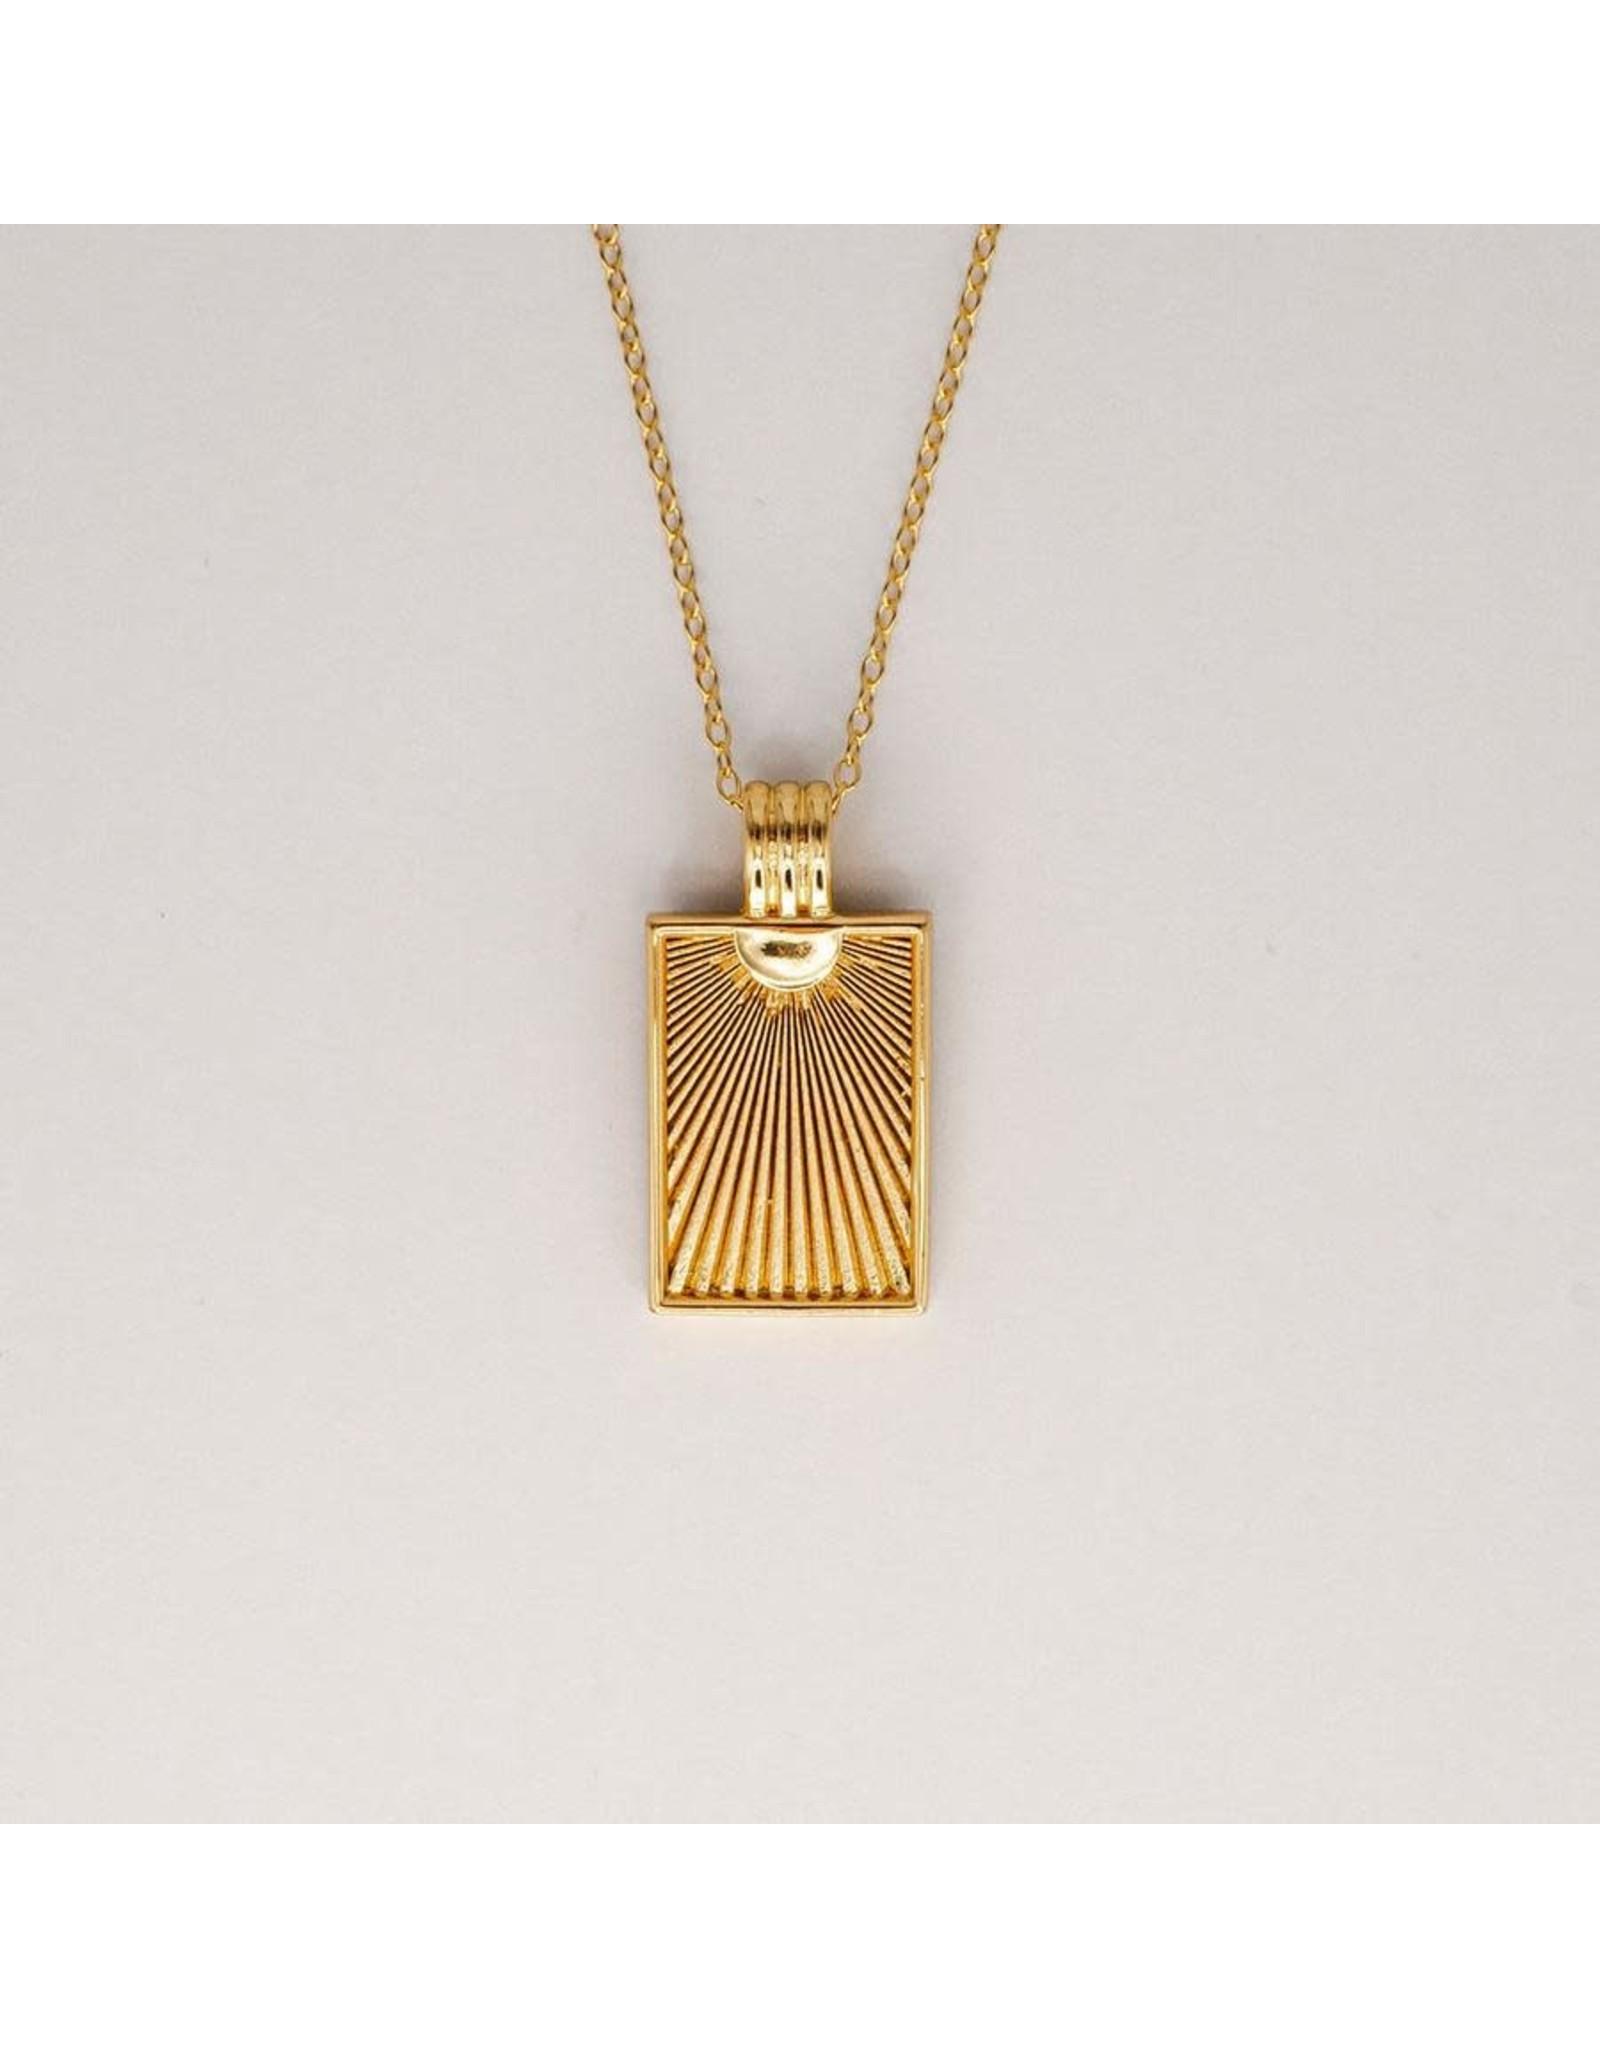 Jewelry By Amanda Nyjah - Pendant